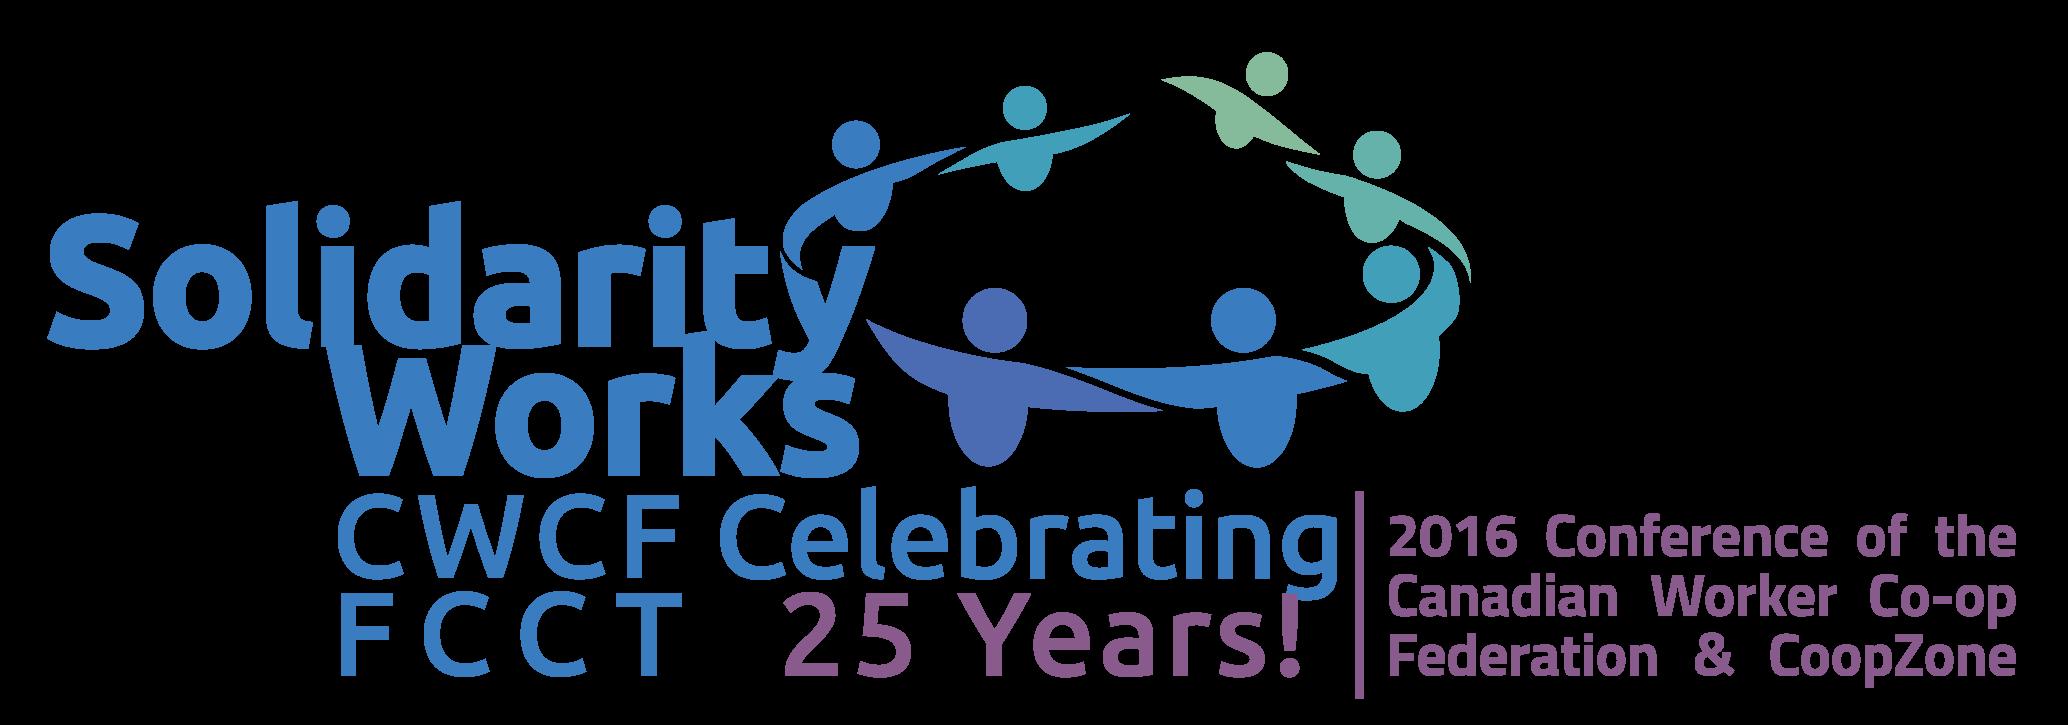 CWCF 25 years